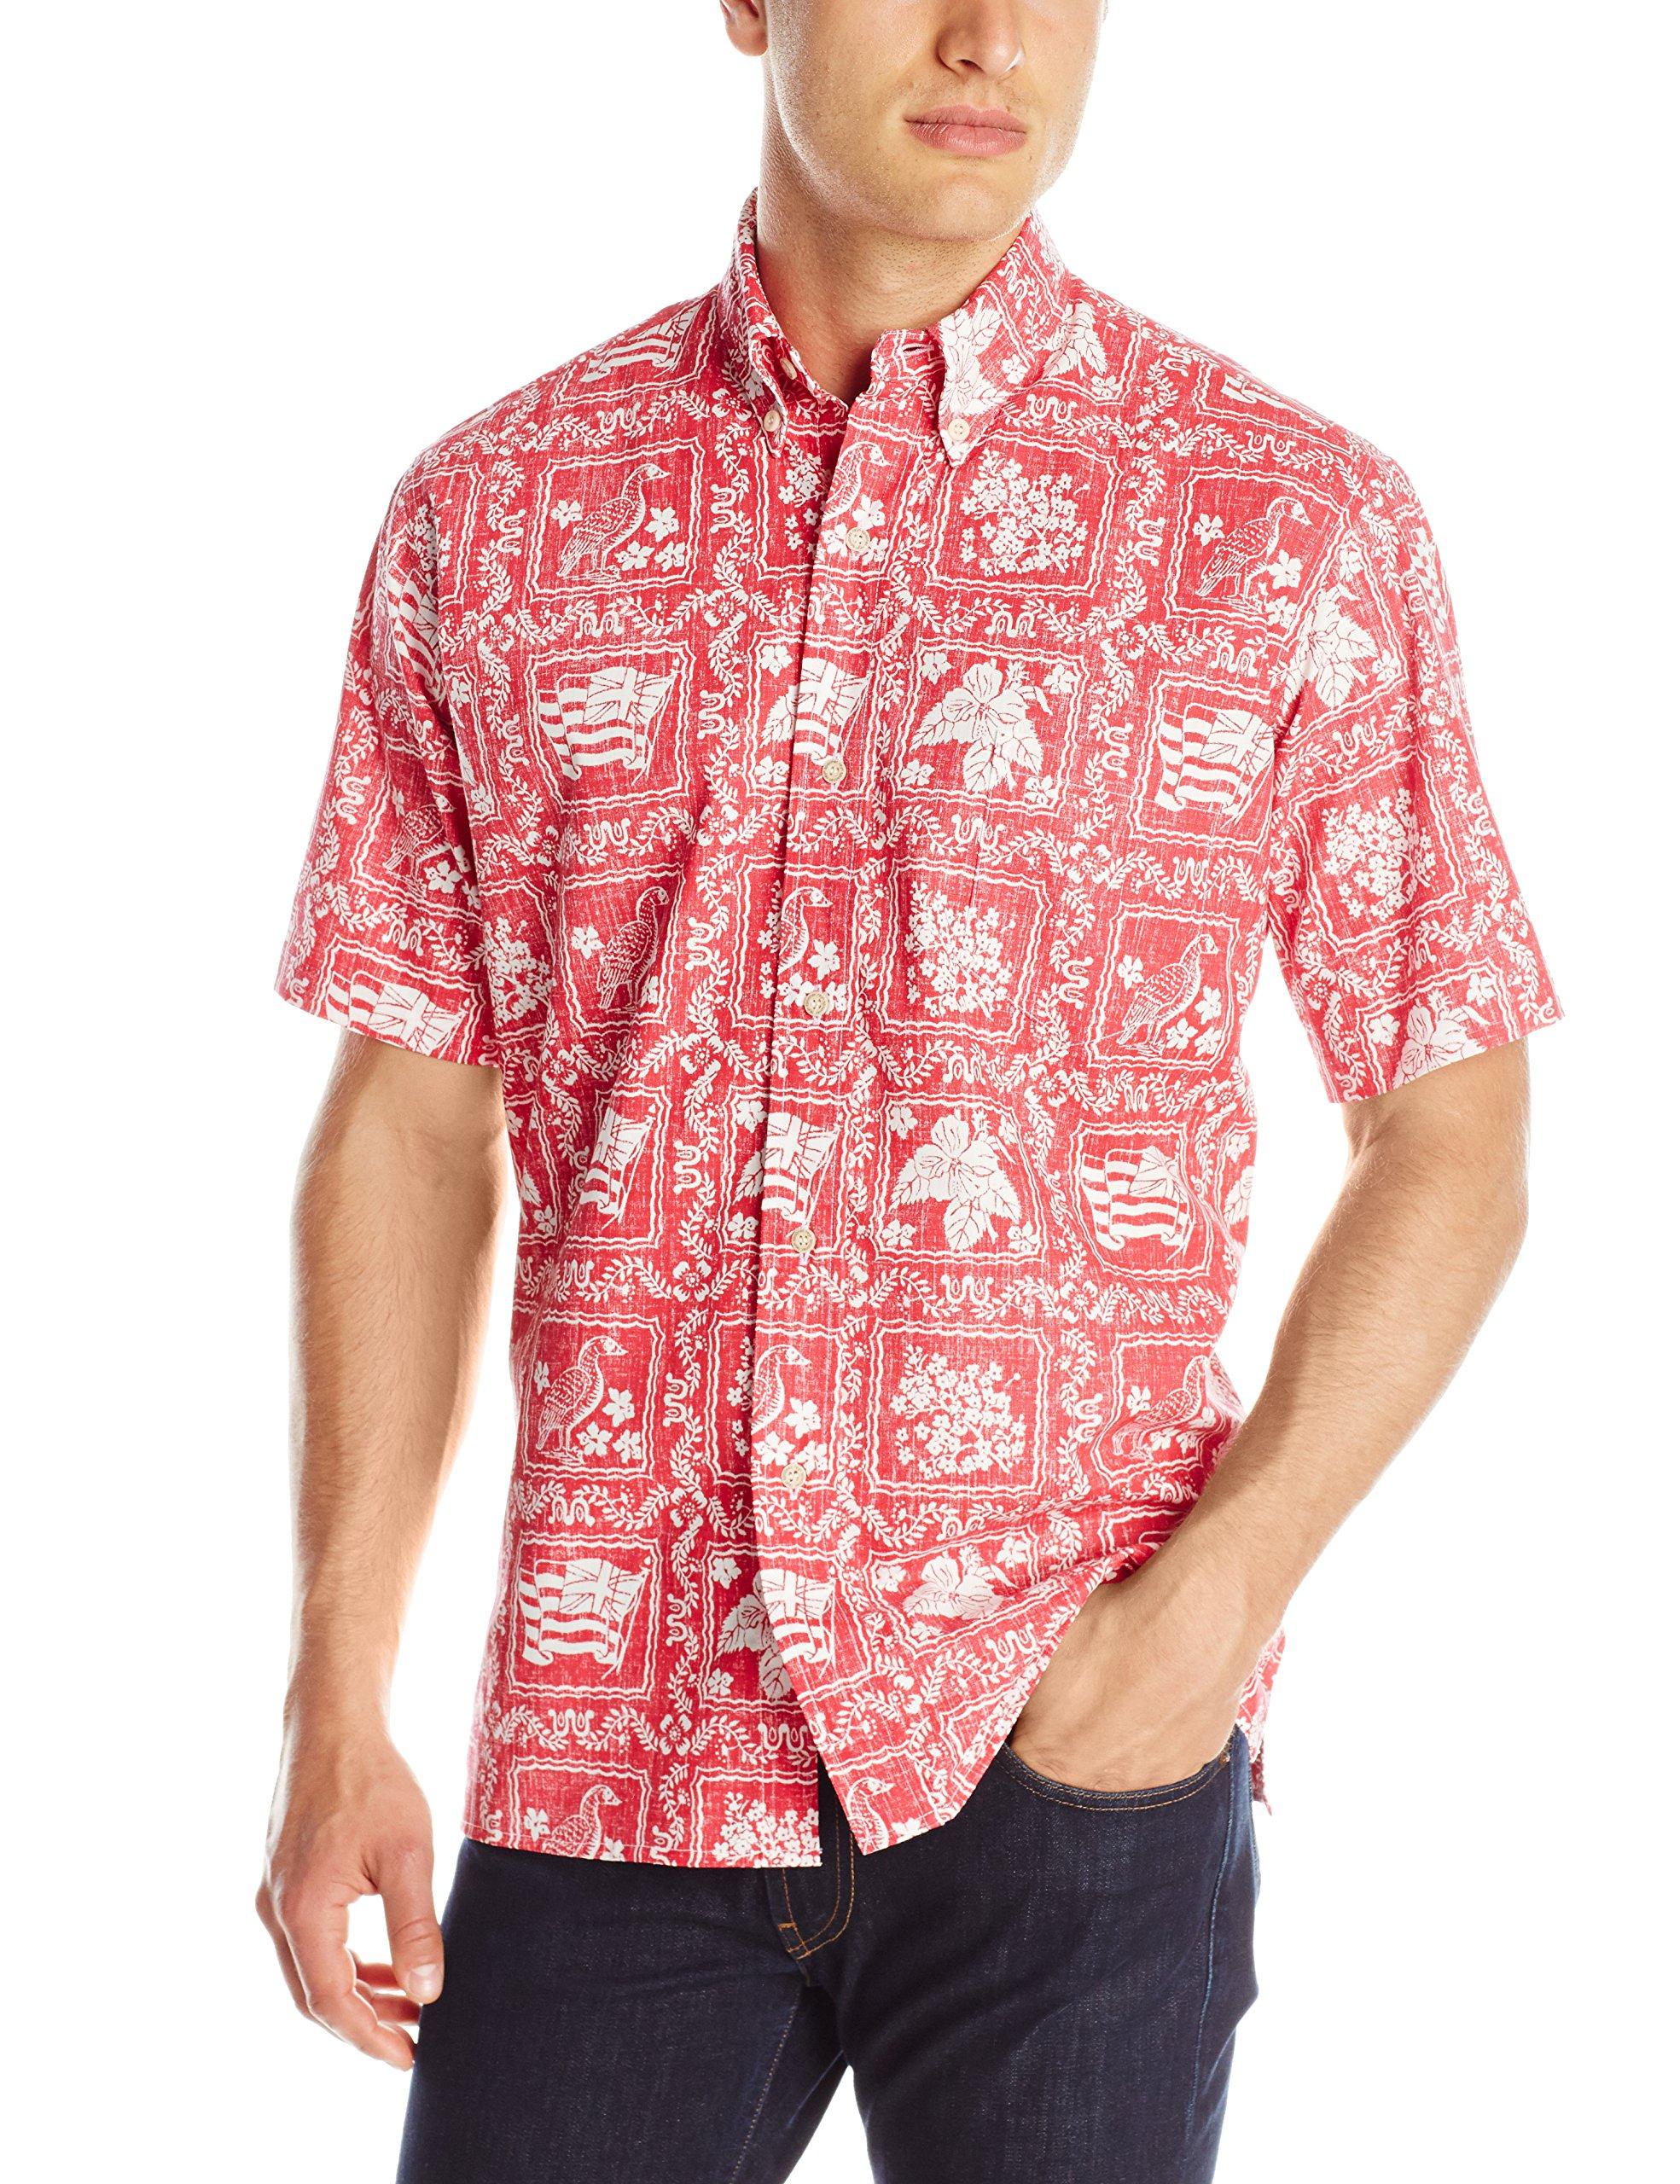 Reyn Spooner Men's Lahaina Sailor Shirt, Red, XX-Large